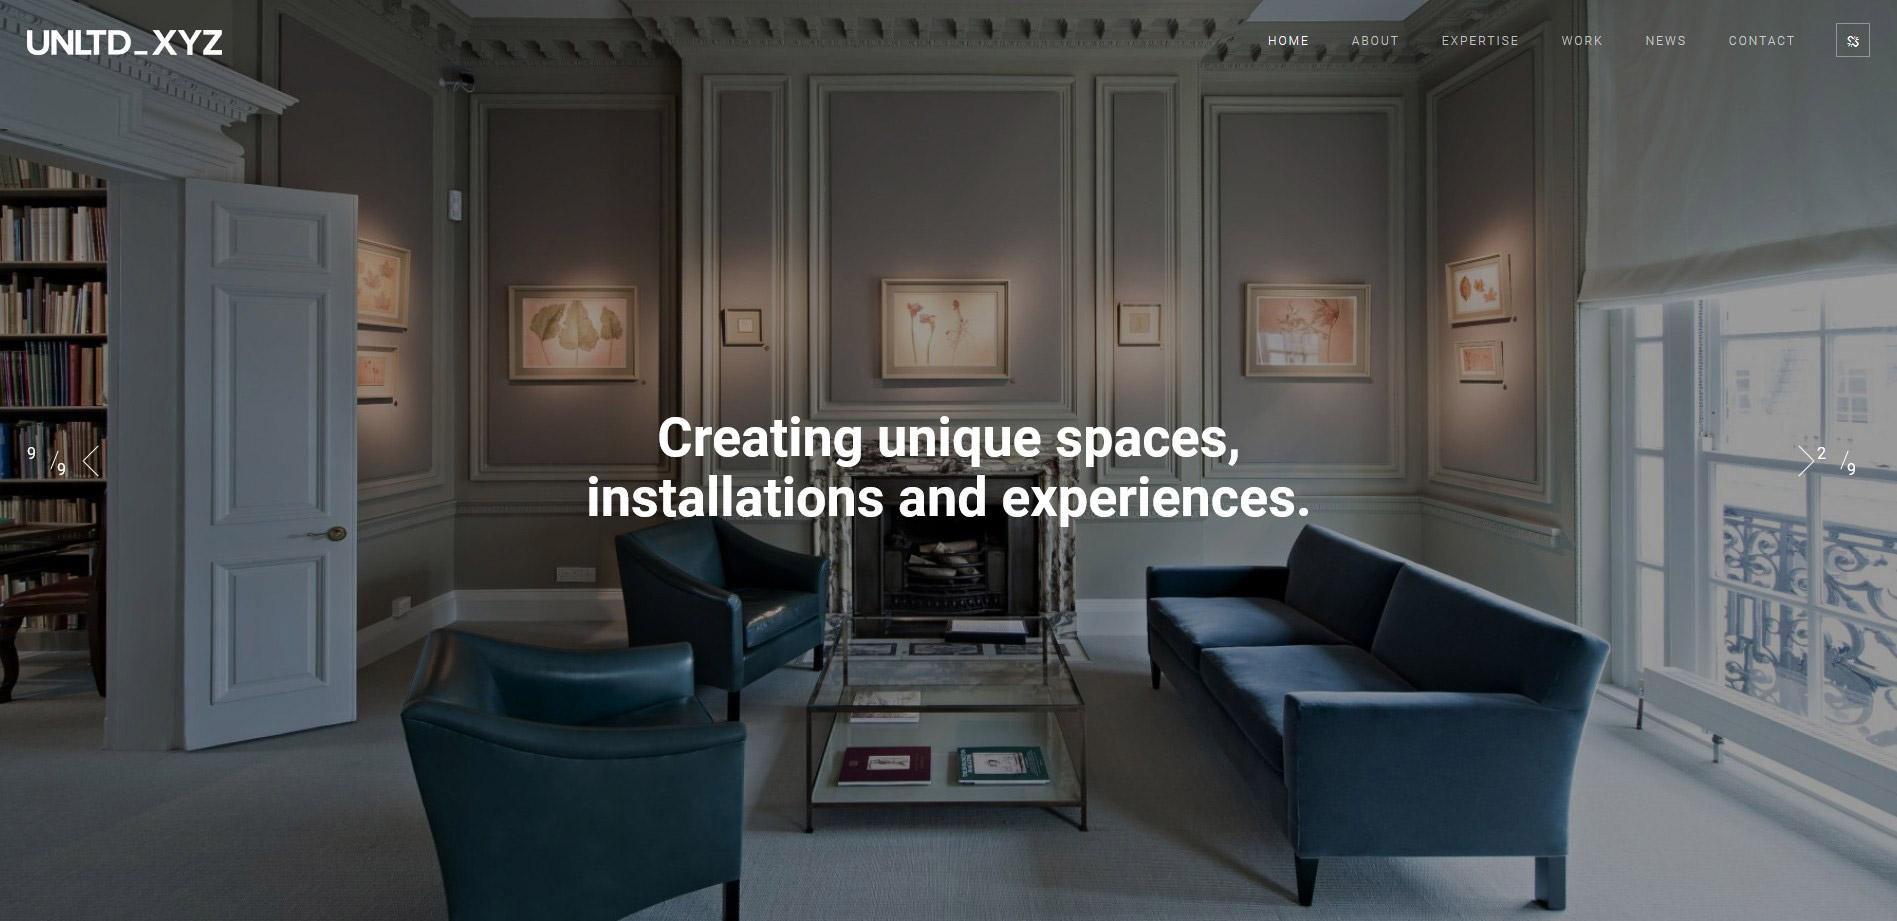 UNLTD London - Website Design Beverley - Weborchard East Yorkshire